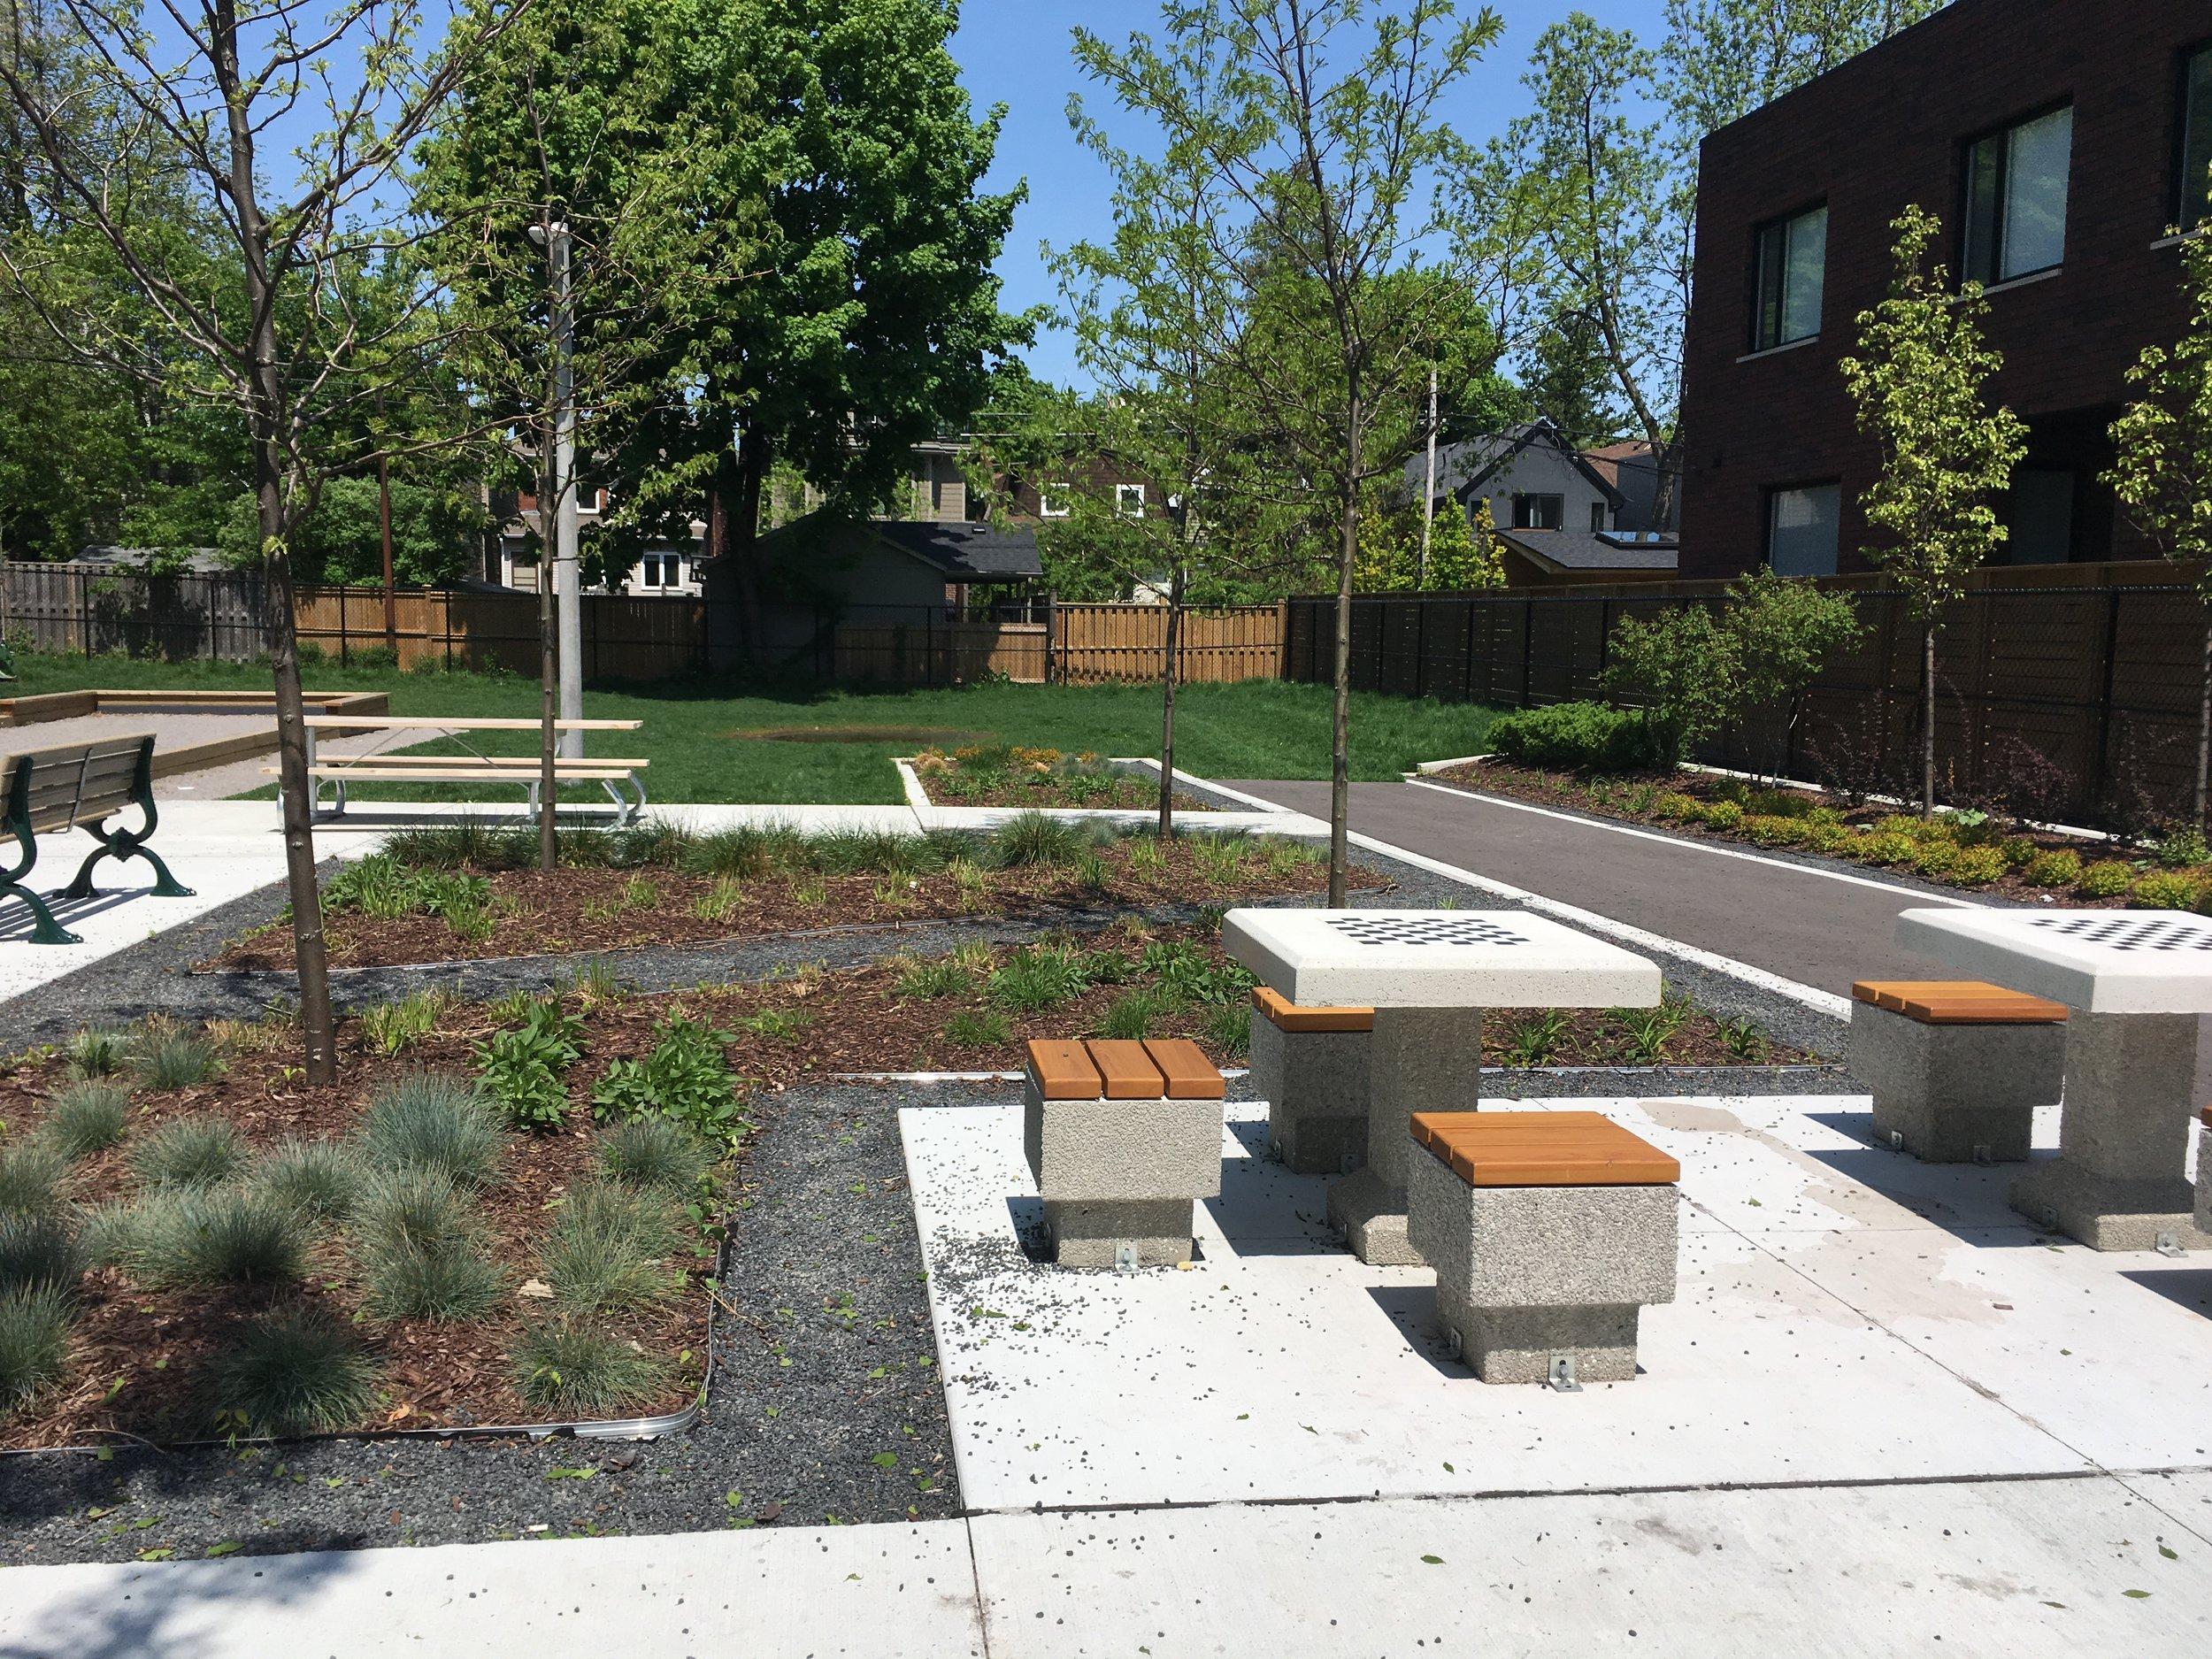 manor-community-green-04.JPG